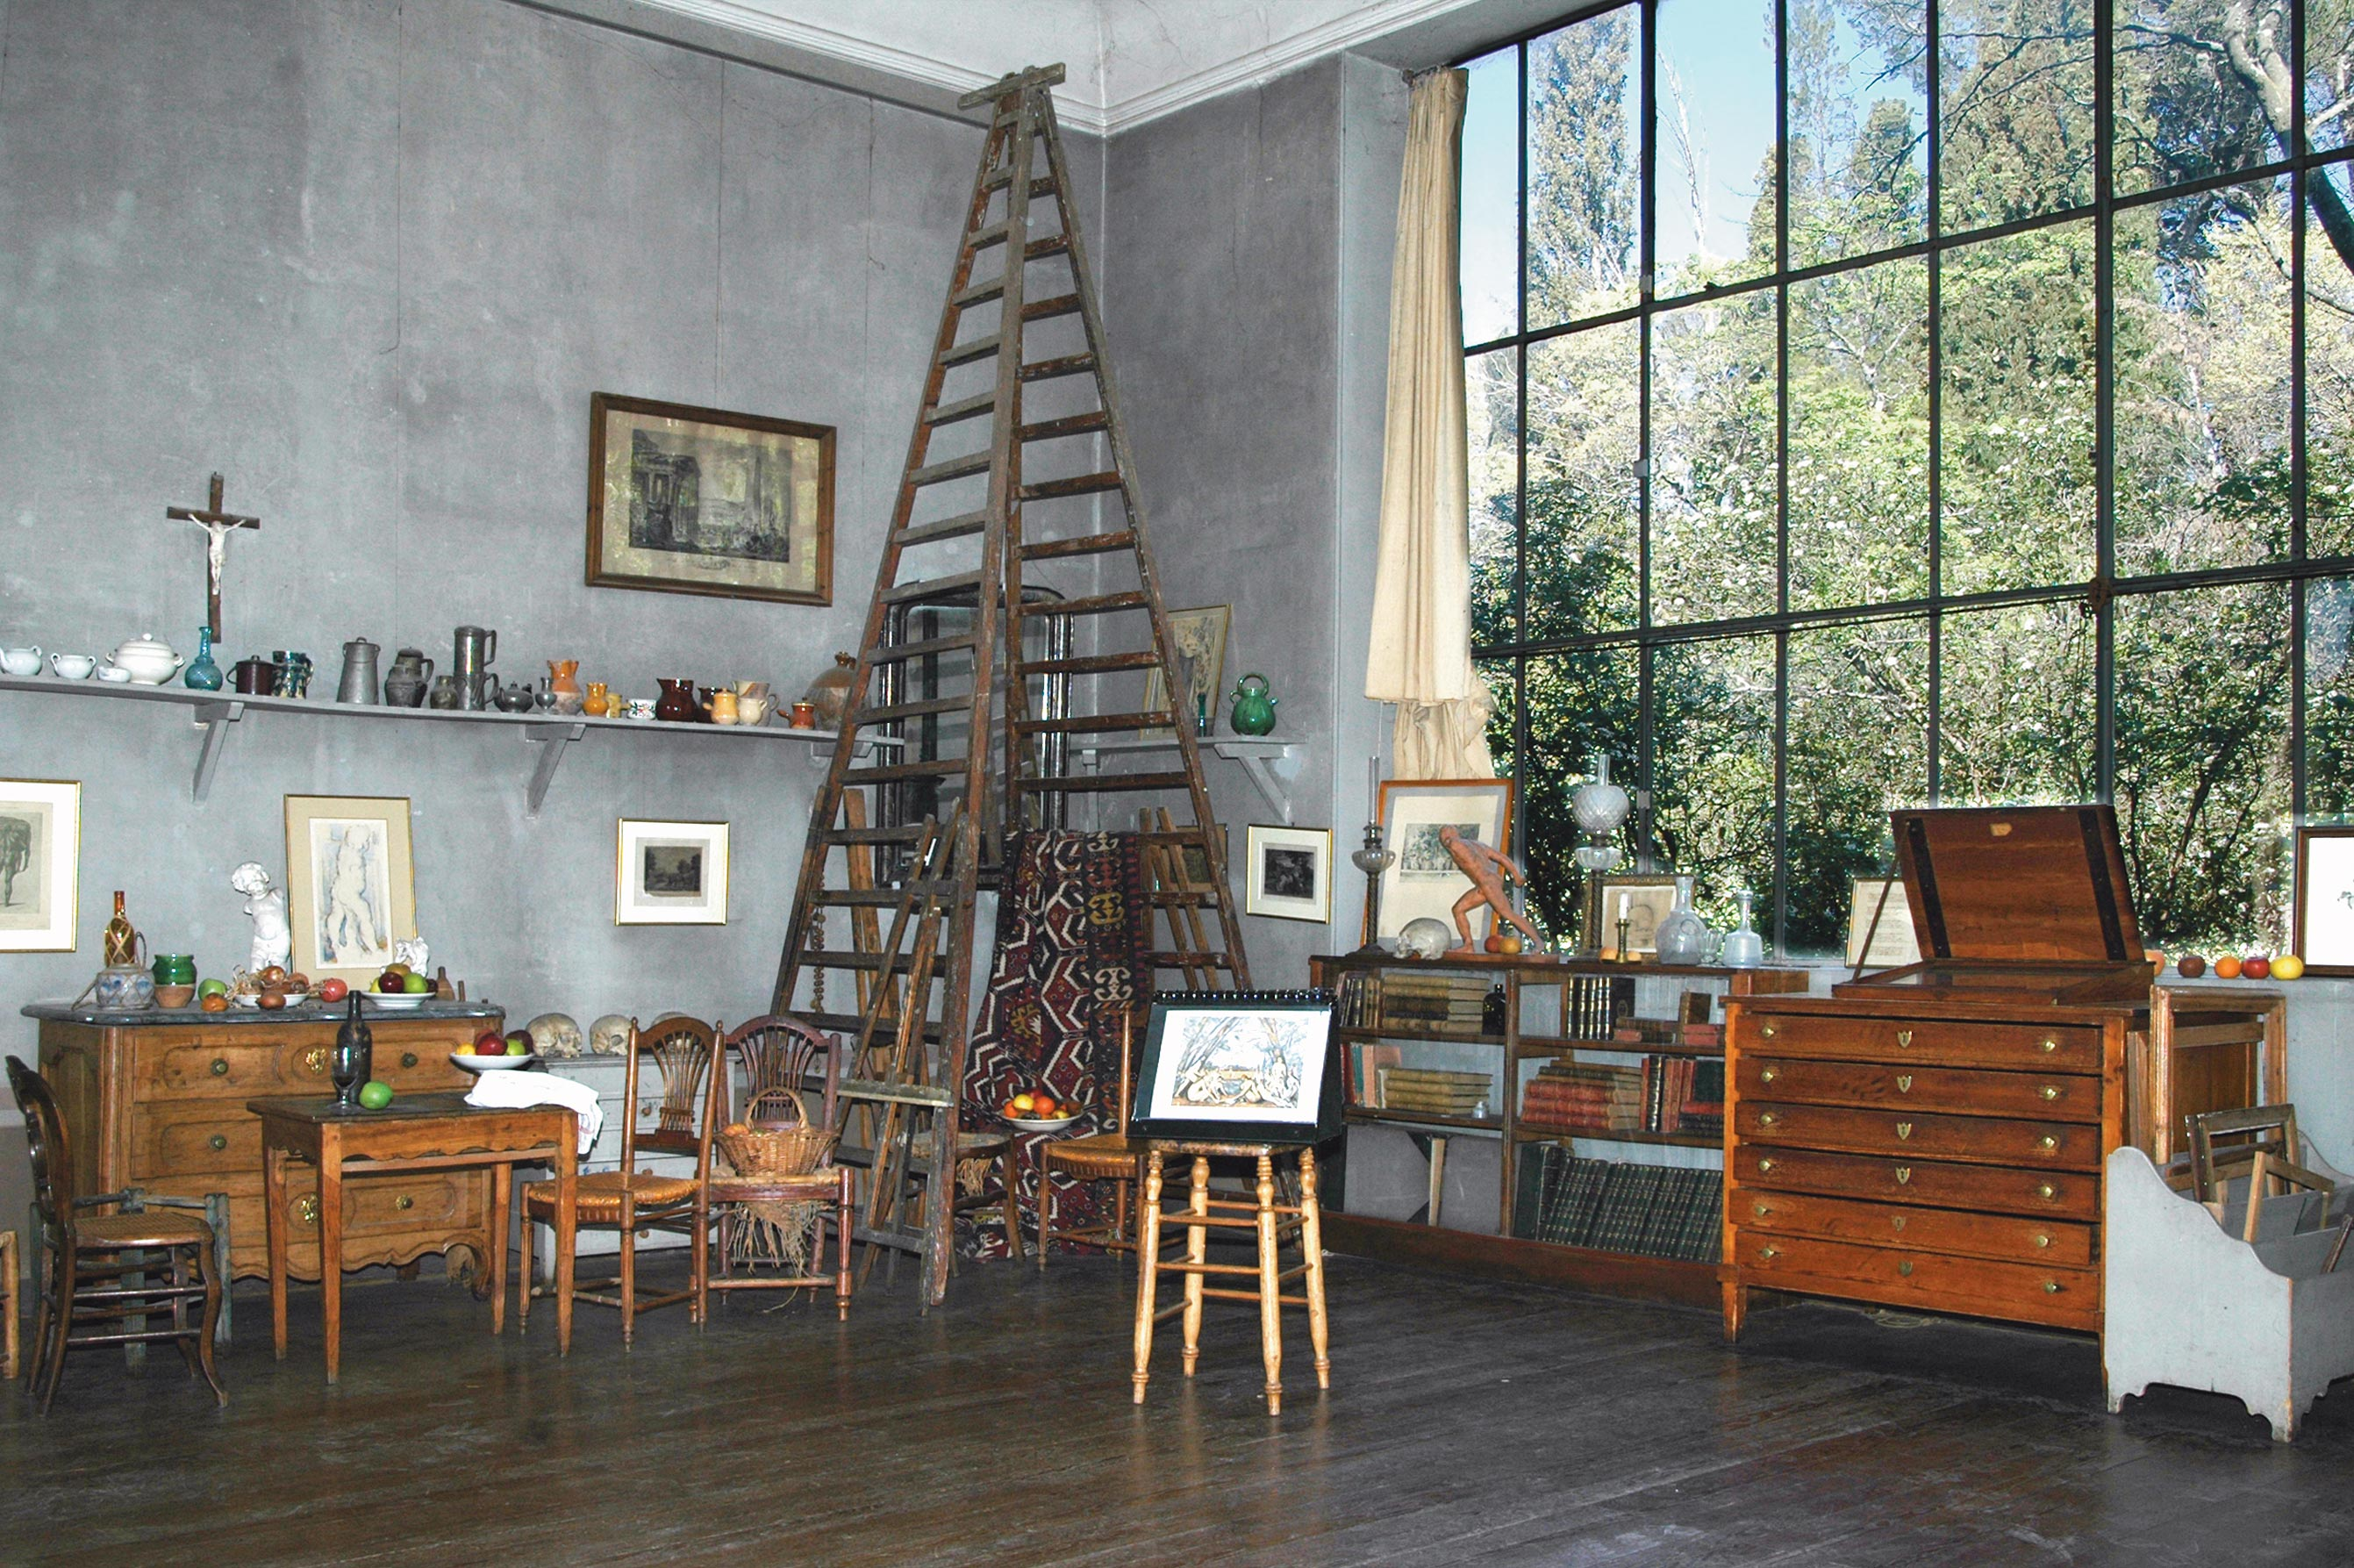 Cézanne műterme Provance-ban